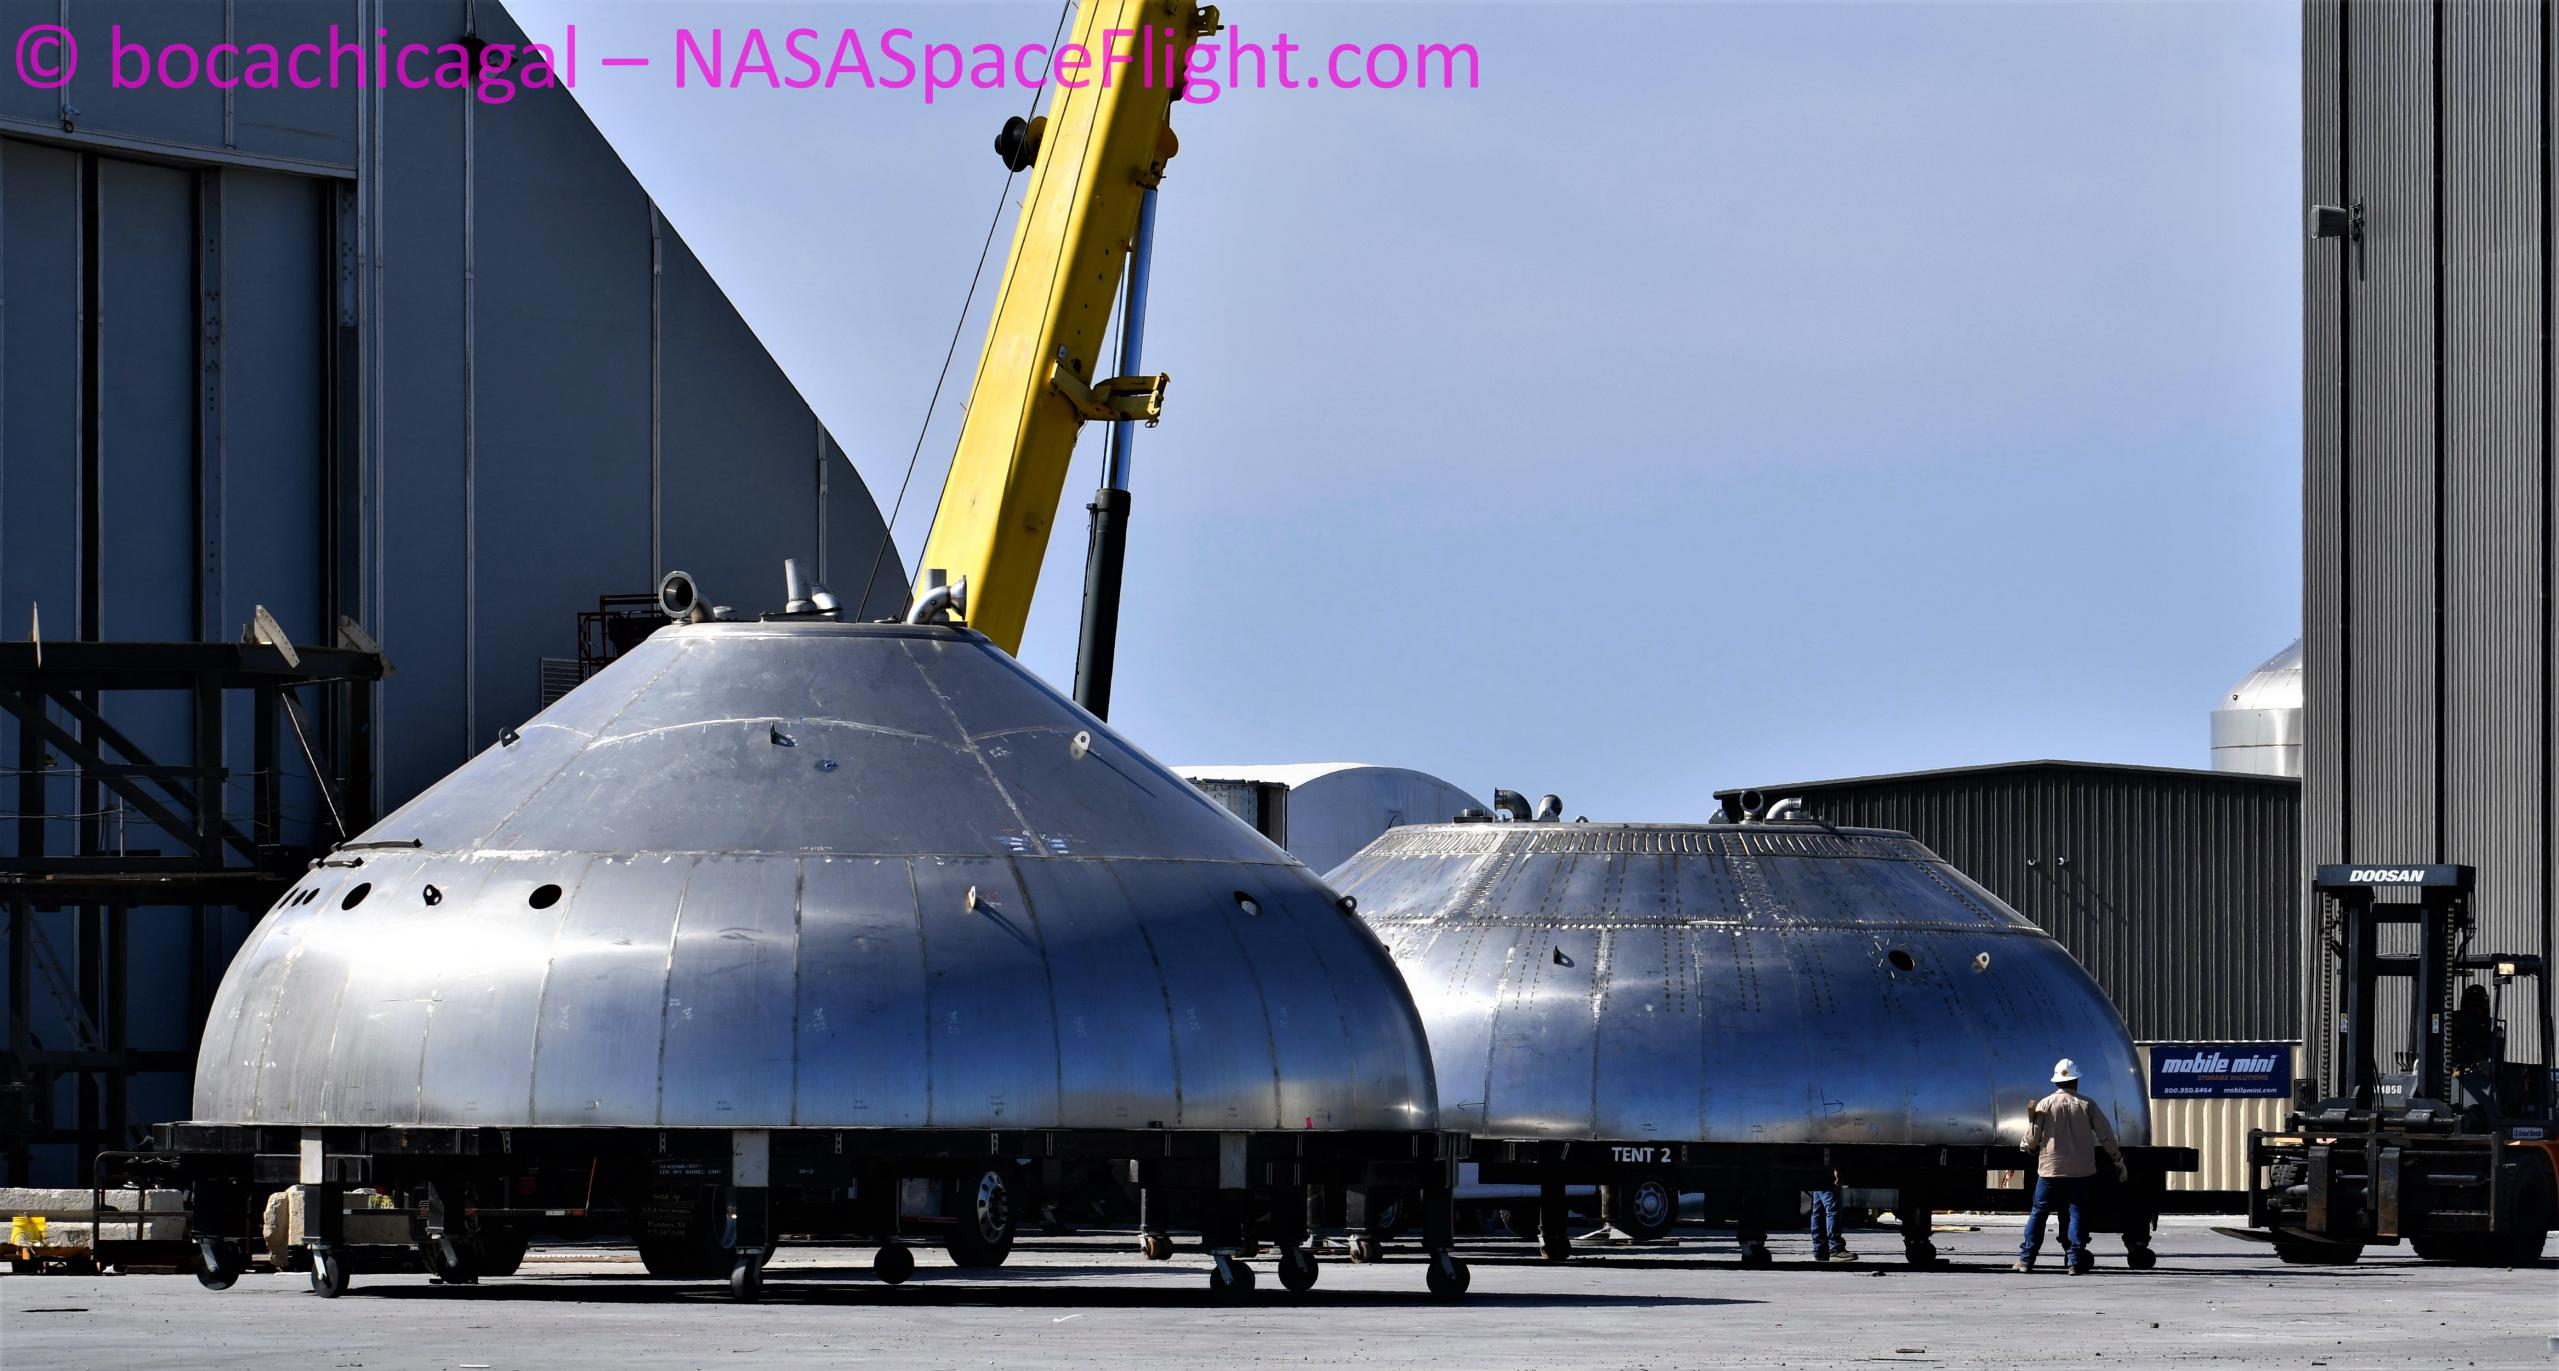 Starship Boca Chica 020721 (NASASpaceflight – bocachicagal) BN1 thrust dome + test dome 1 crop (c)